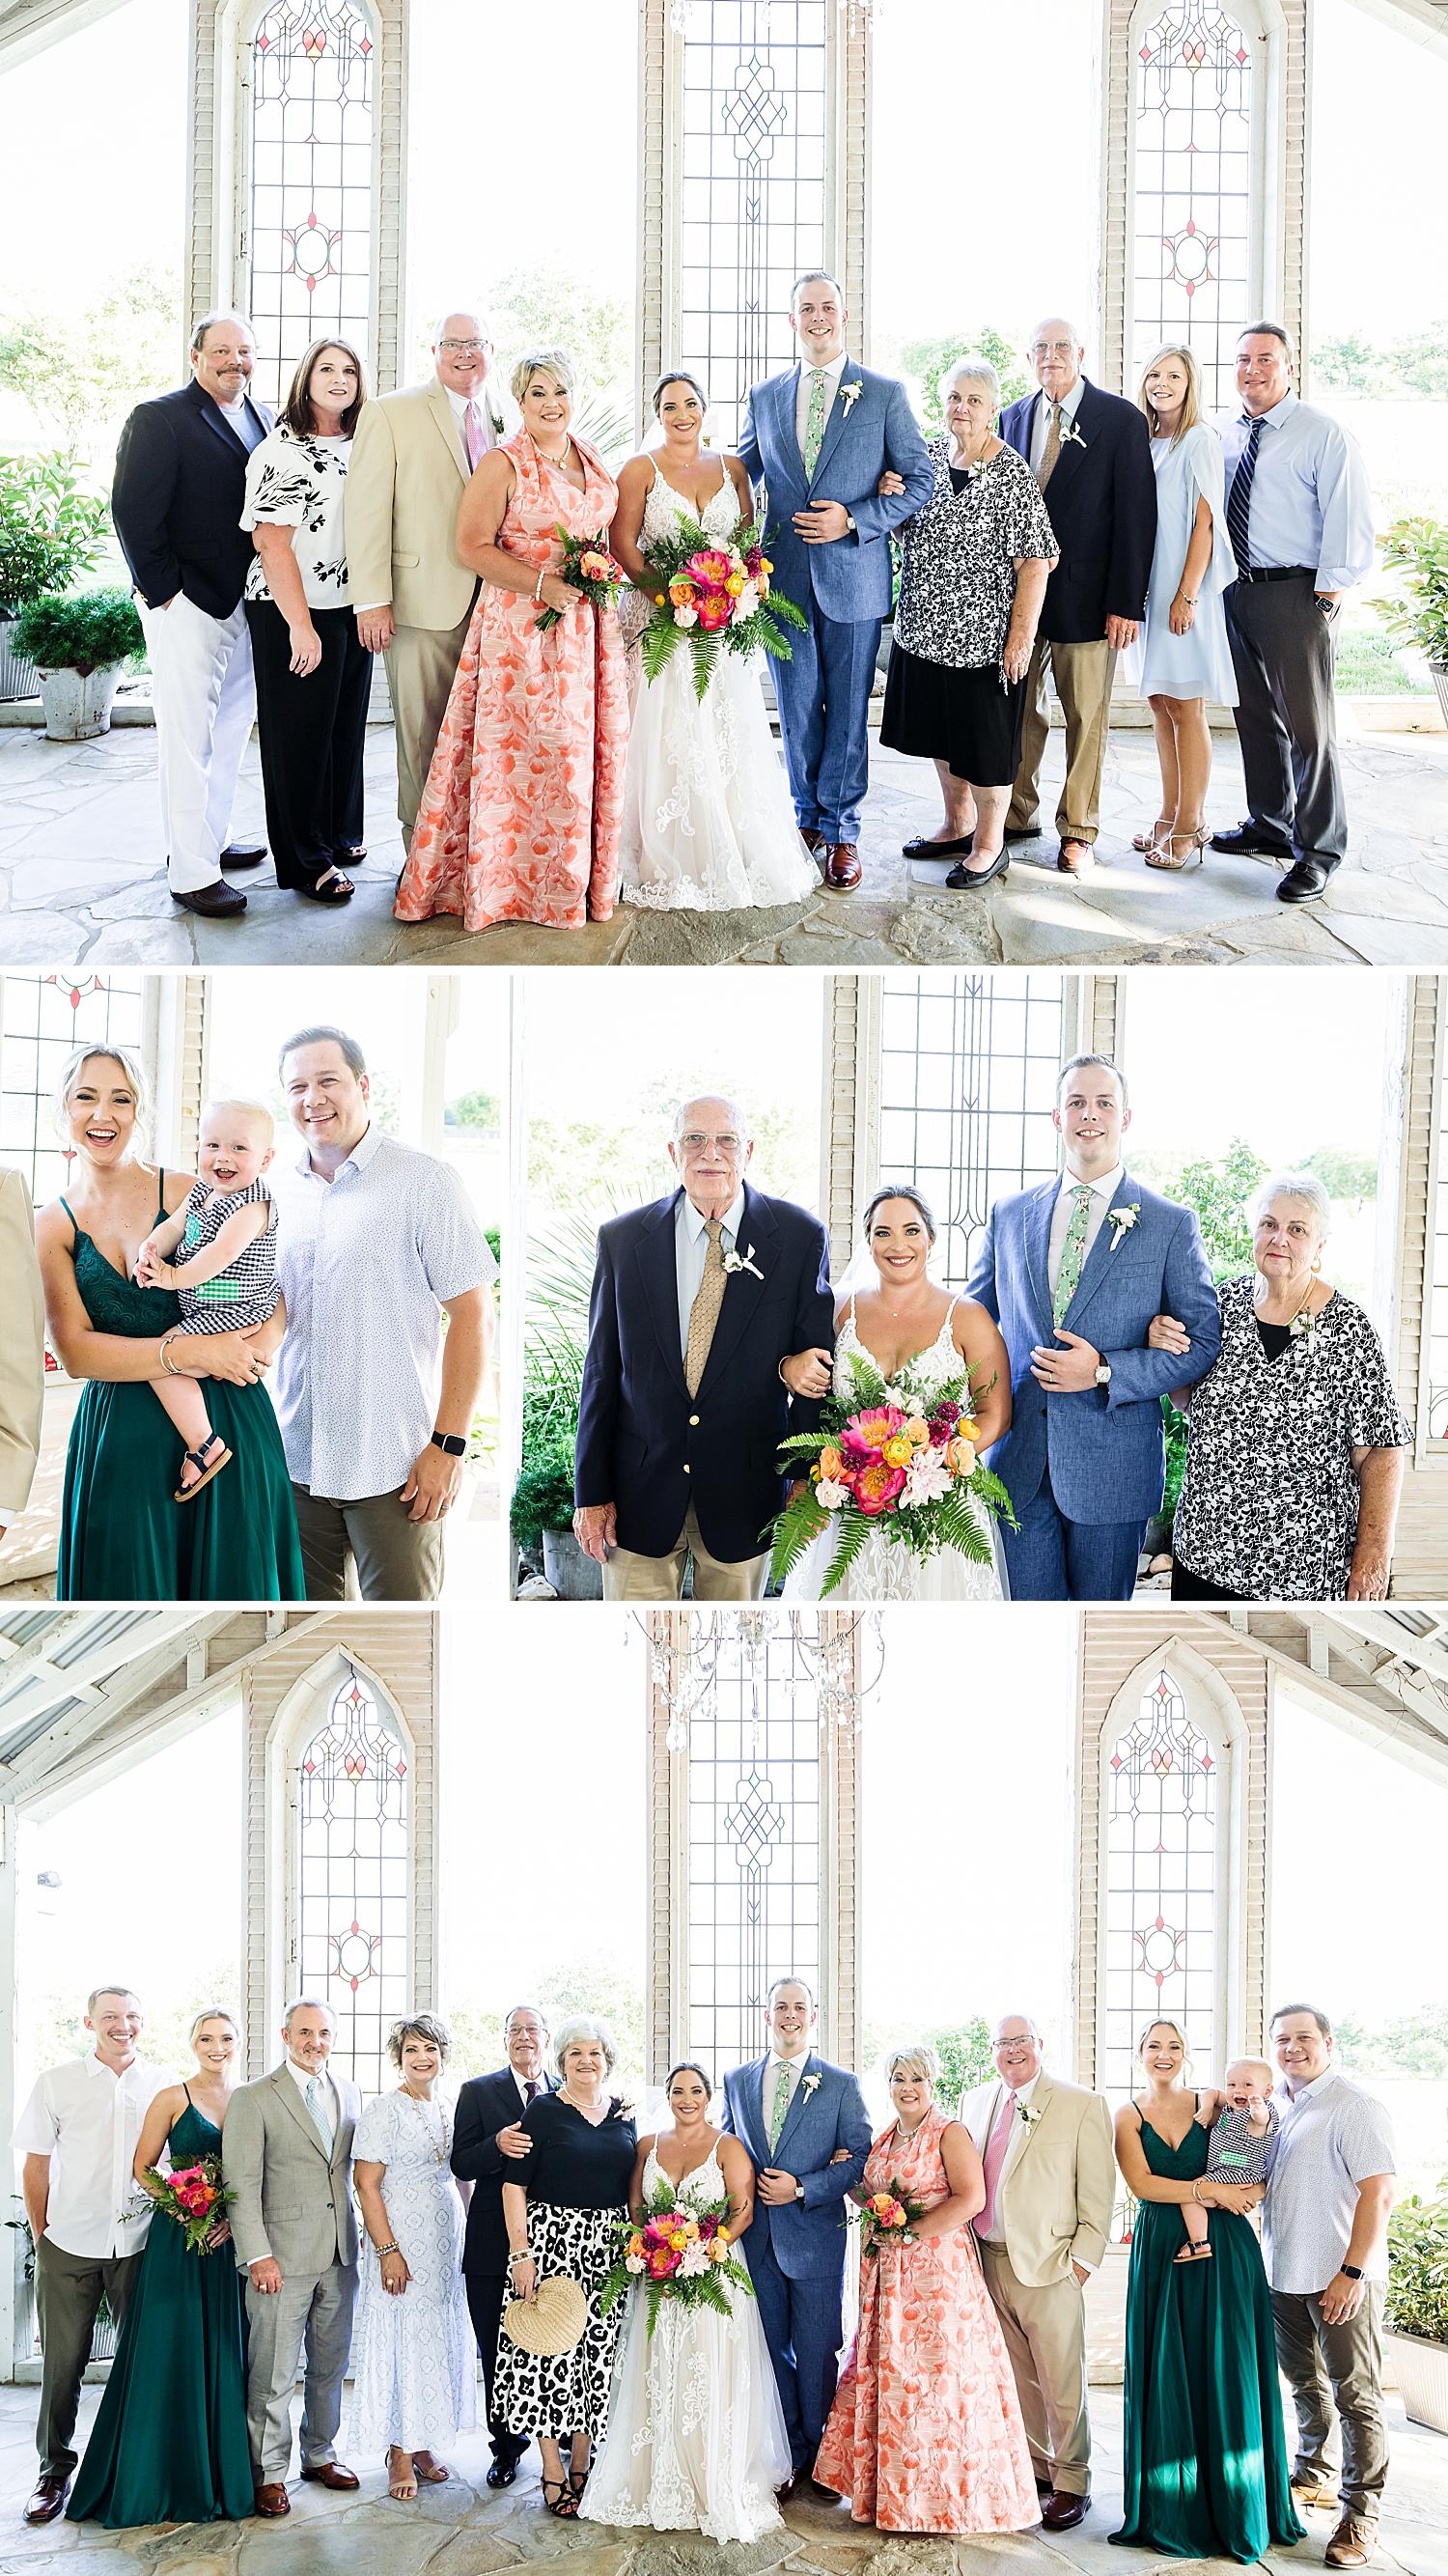 Gruene-Estate-Wedding-New-Braunfels-Bride-Wedding-Photos-Carly-Barton-Photography_0081.jpg